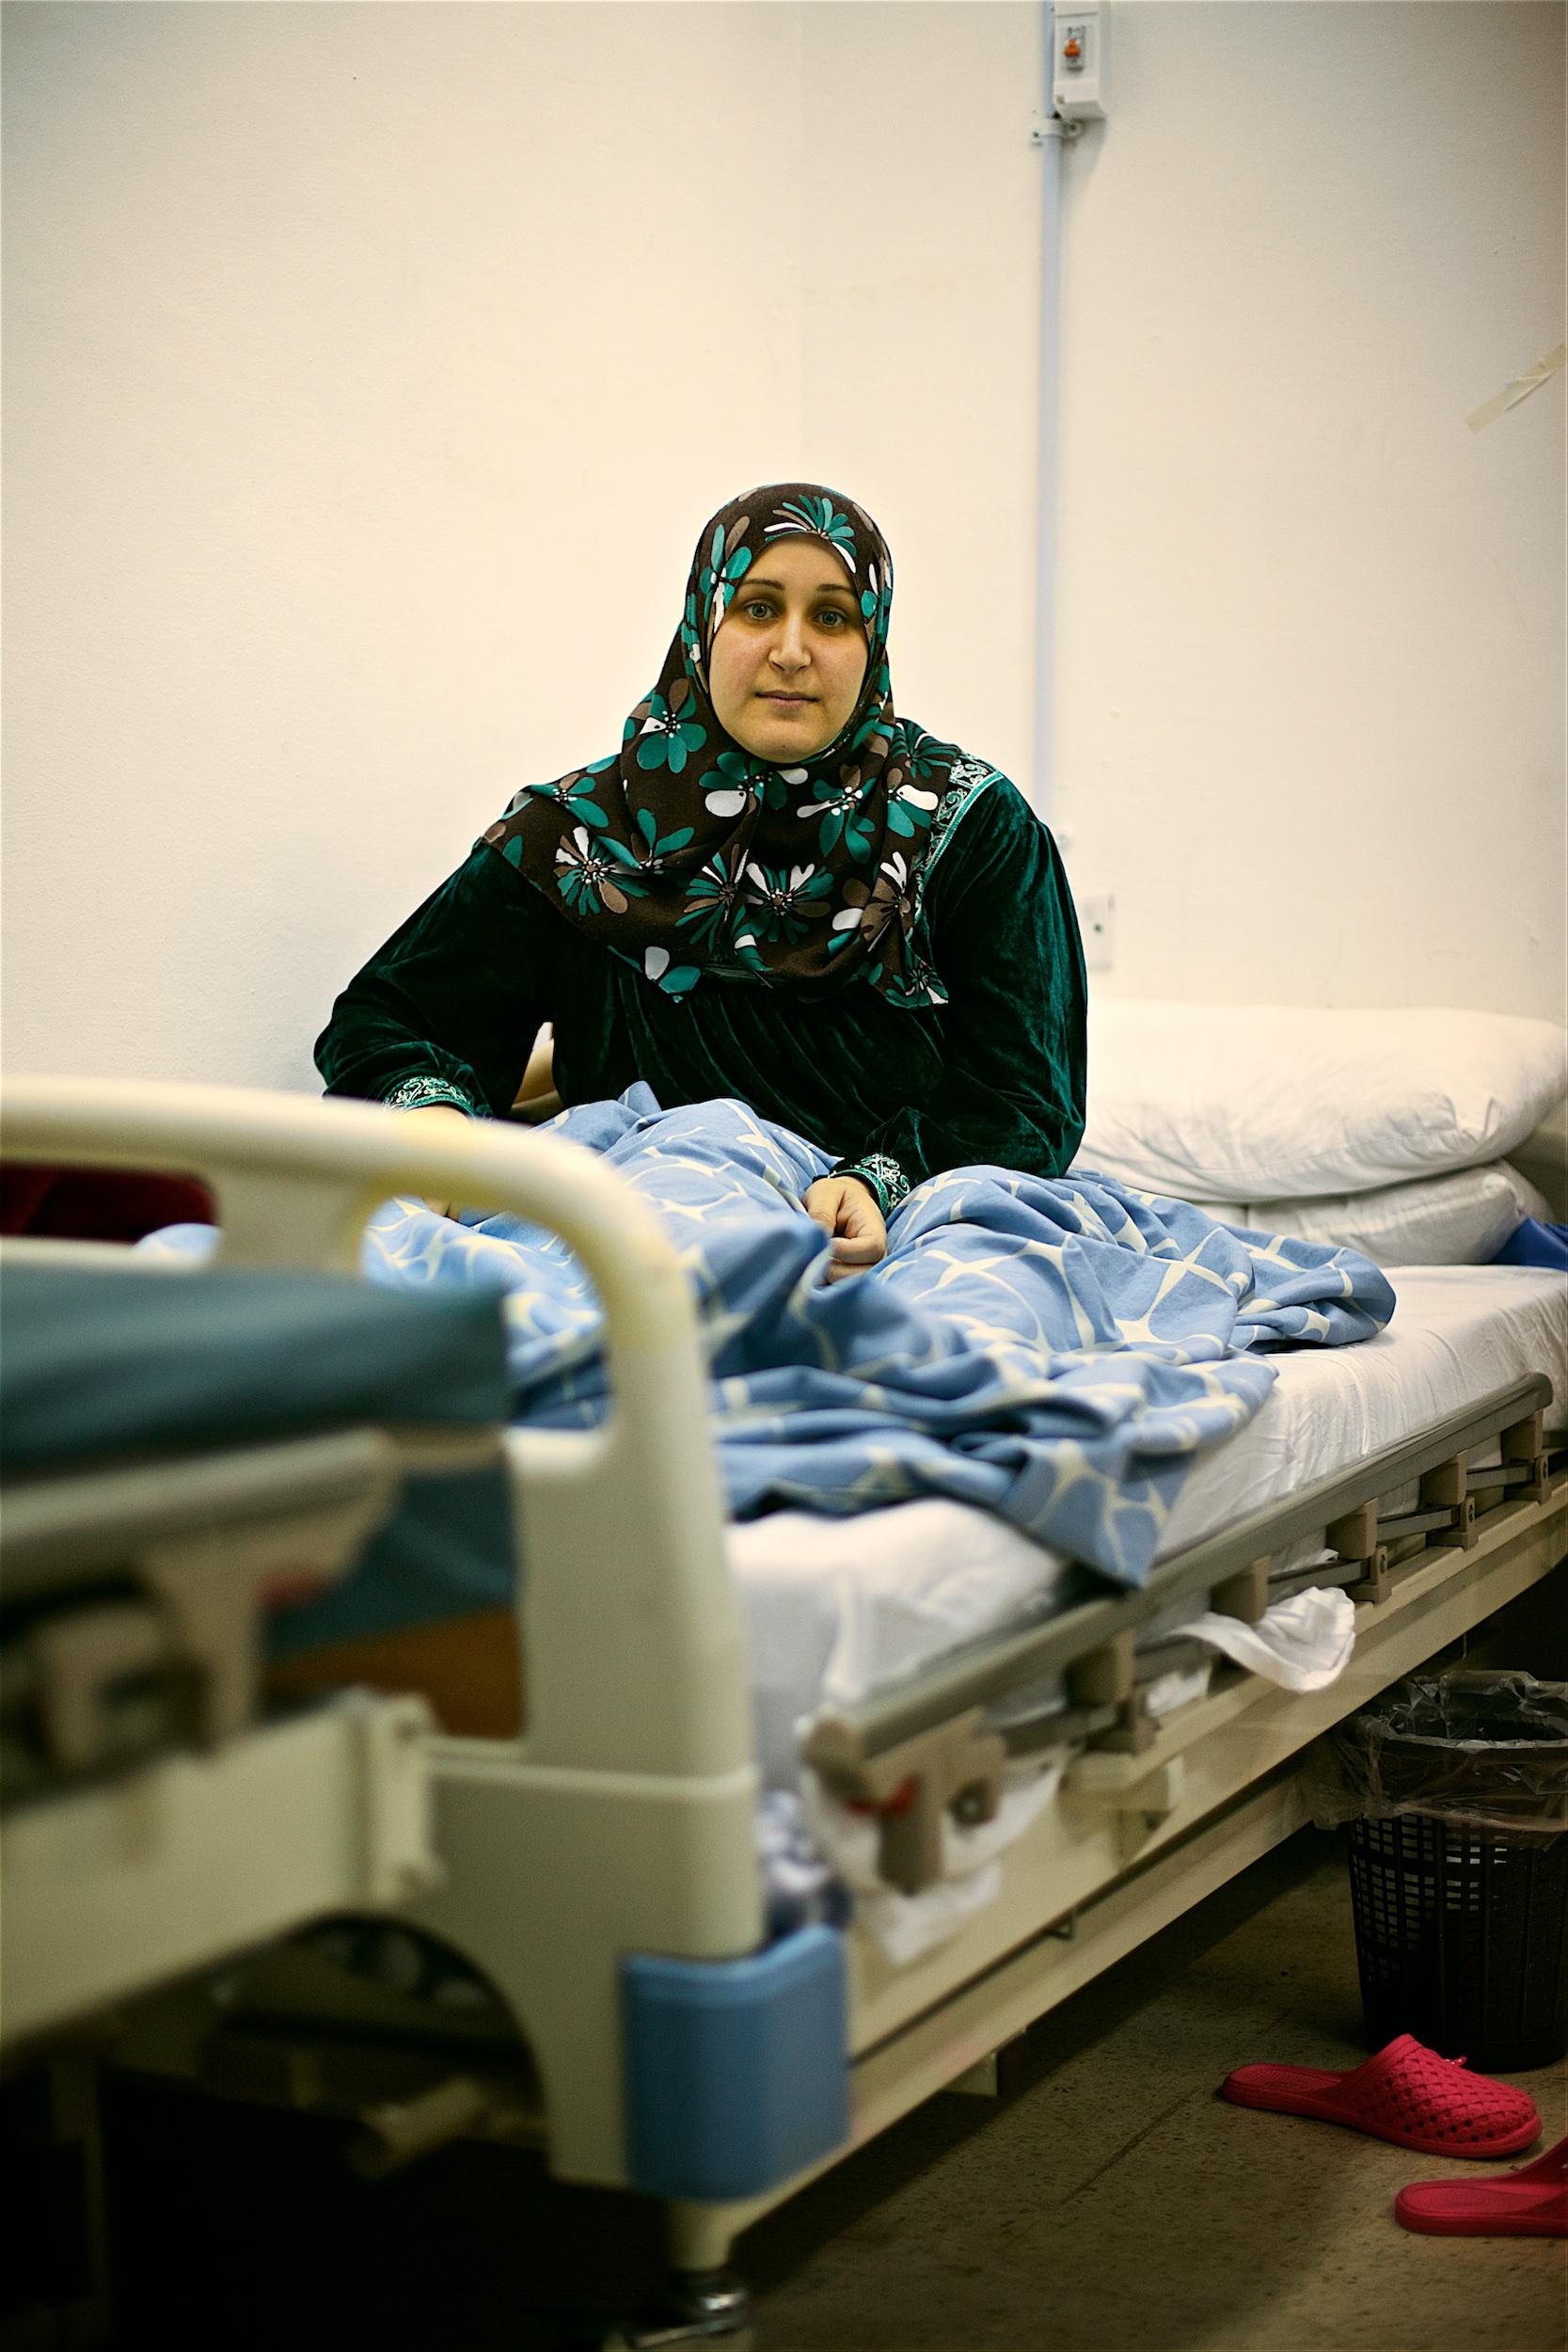 jordan-msf-al-ramtha-dectors-without-borders-war-hospital-refugee-camp-denis-bosnic-36.jpg